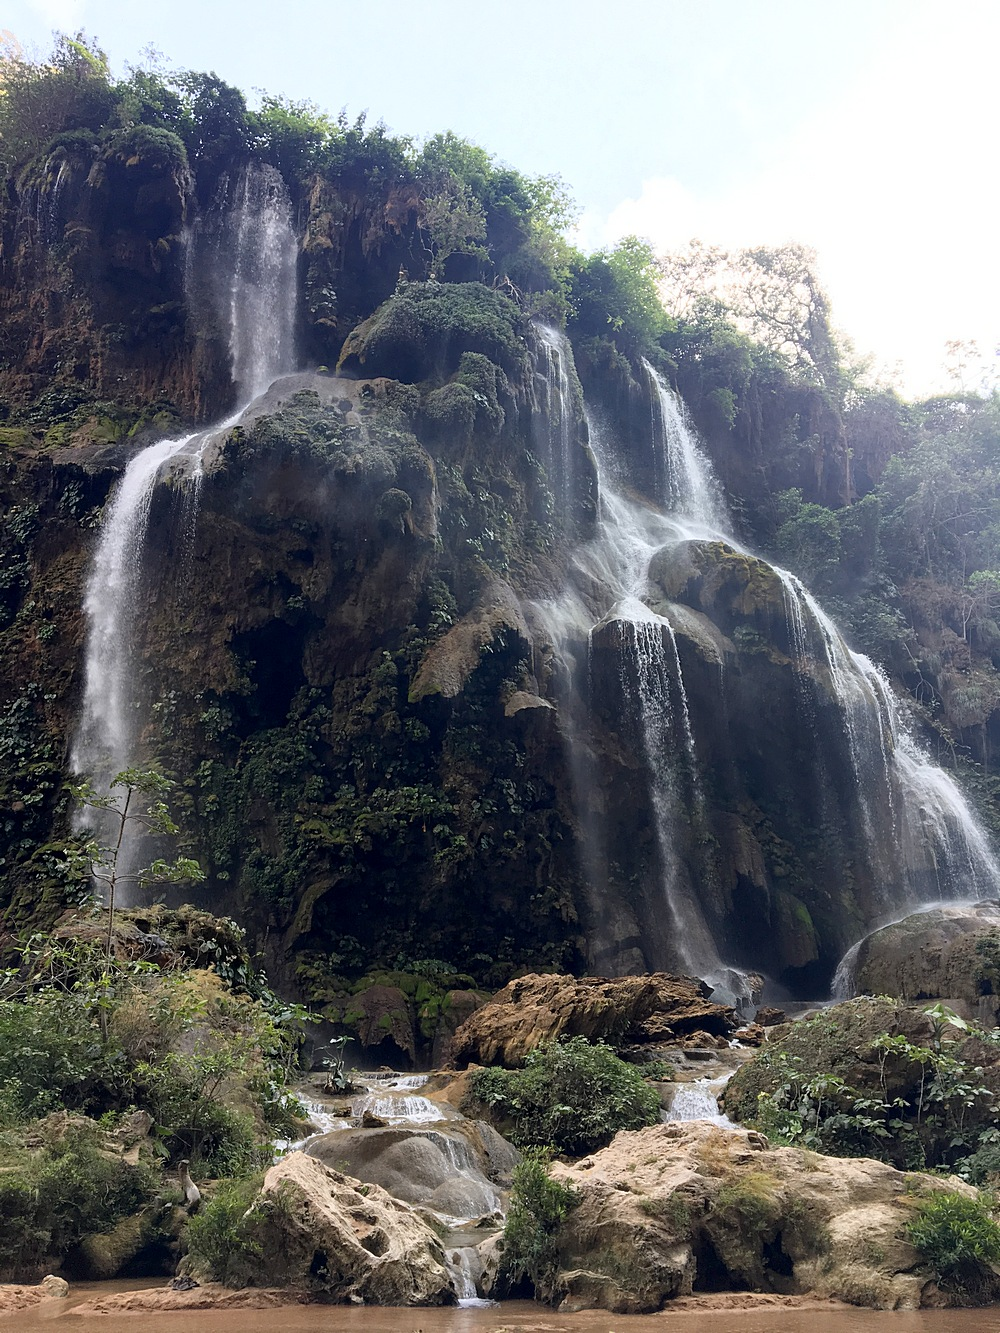 Erfrischende Cascades de Aguacero